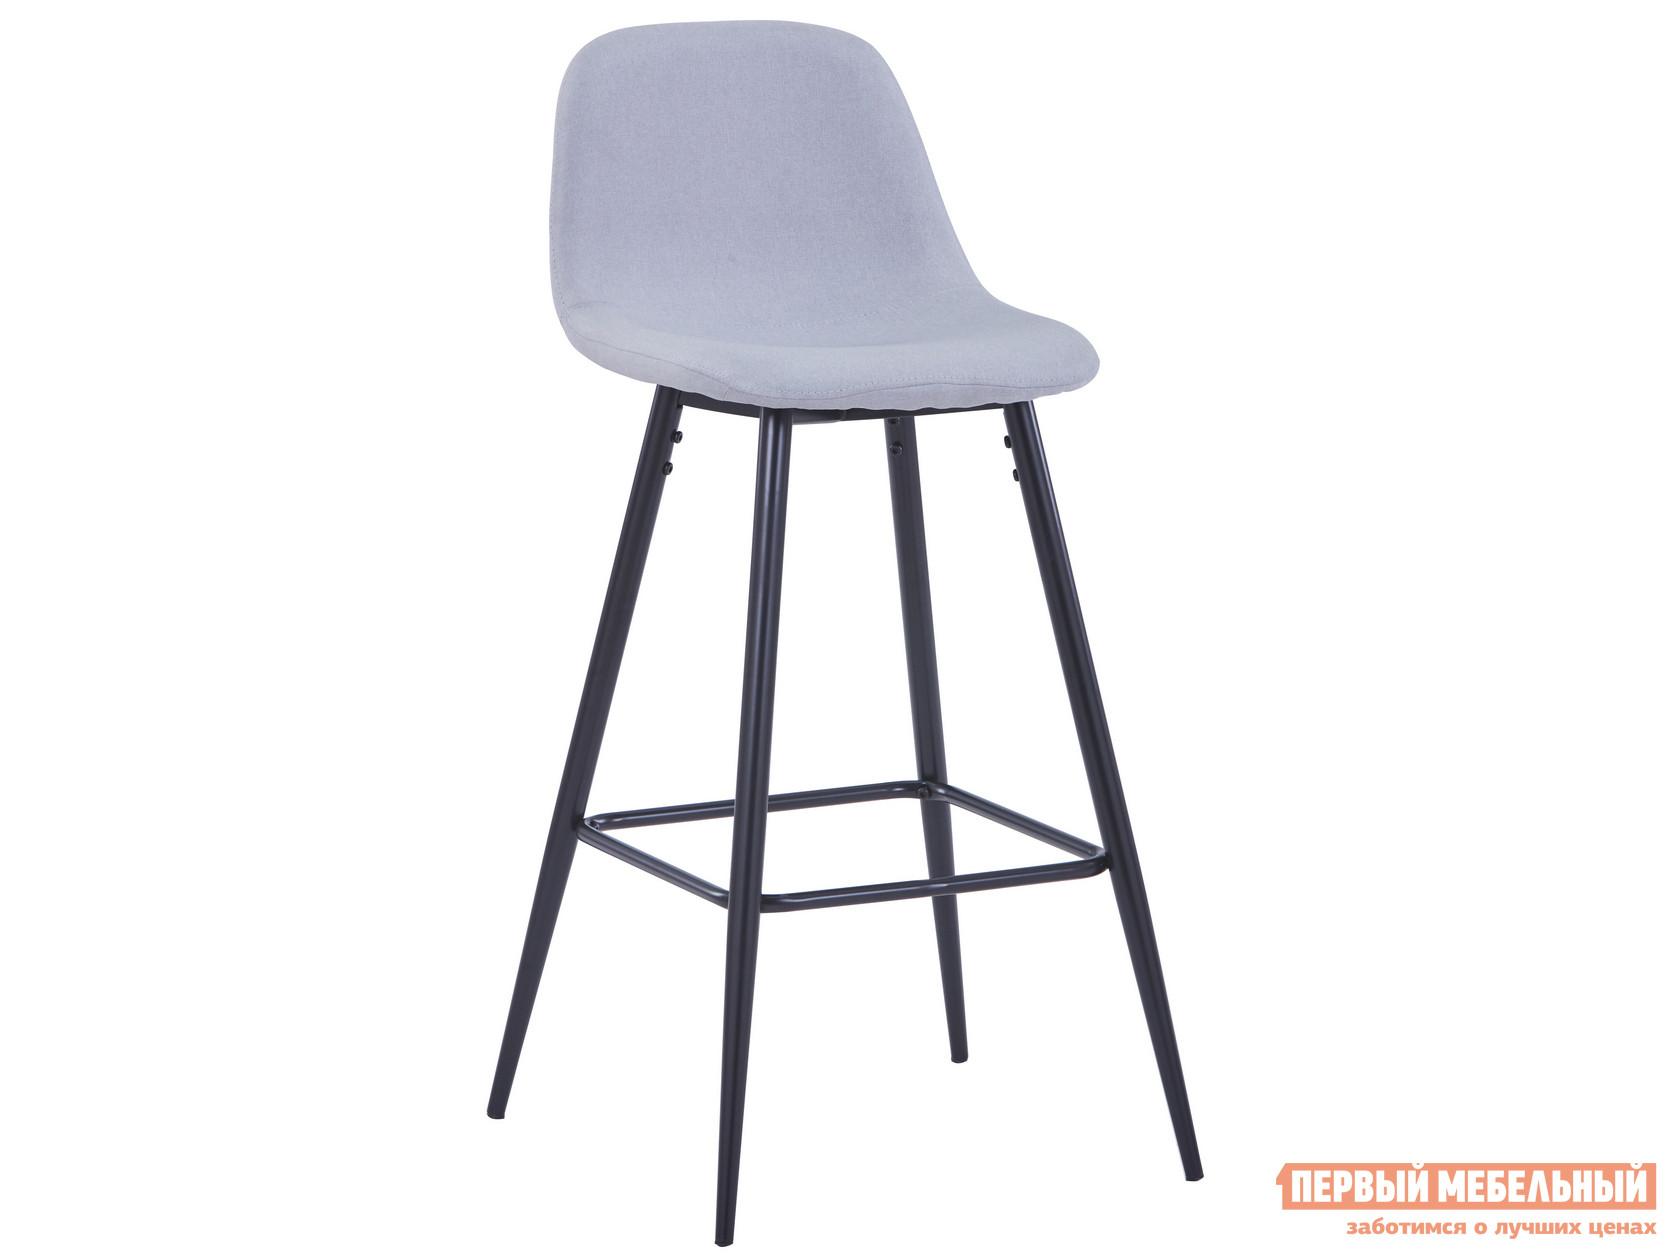 Барный стул  Валенсия Светло-серый, рогожка STOOL GROUP 104924